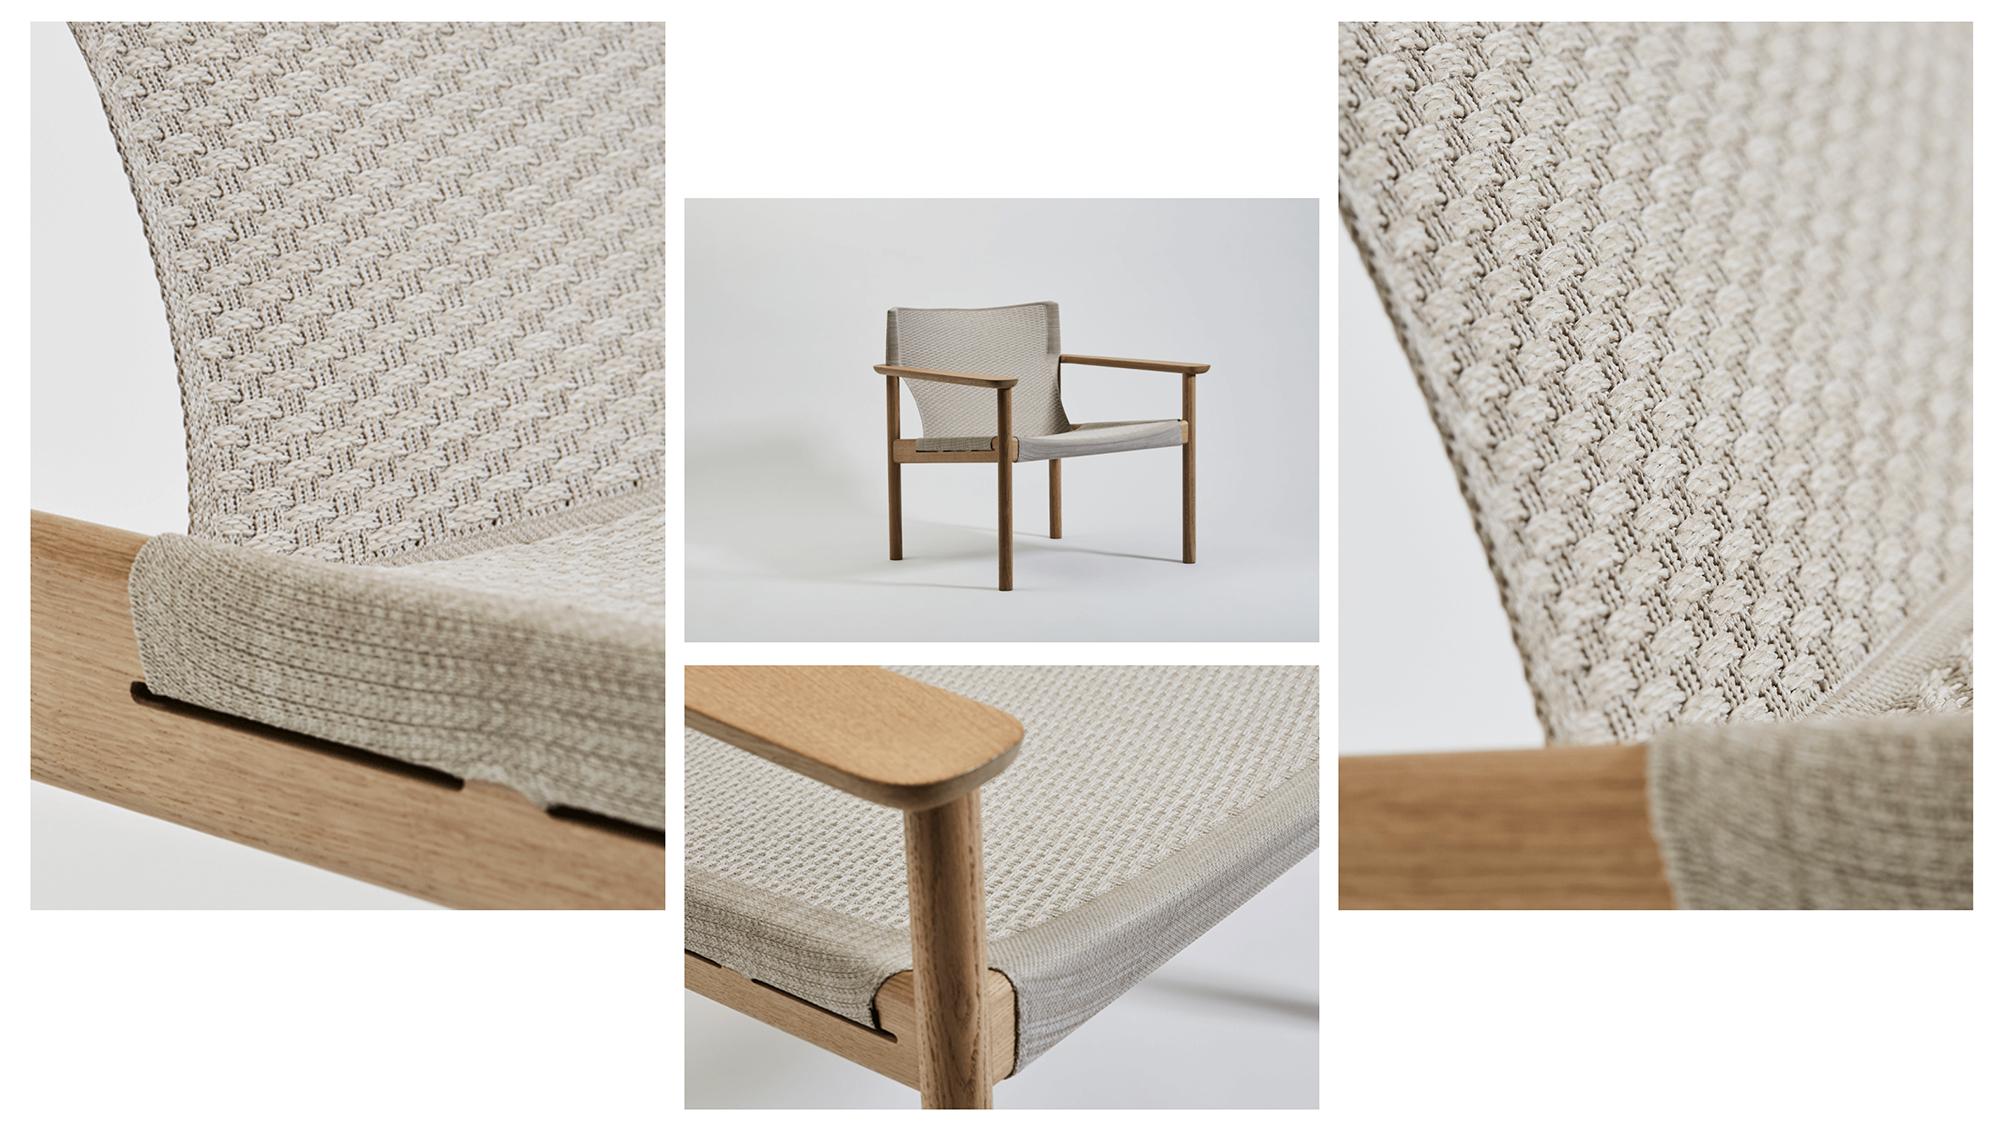 Camira-Knit-images-1